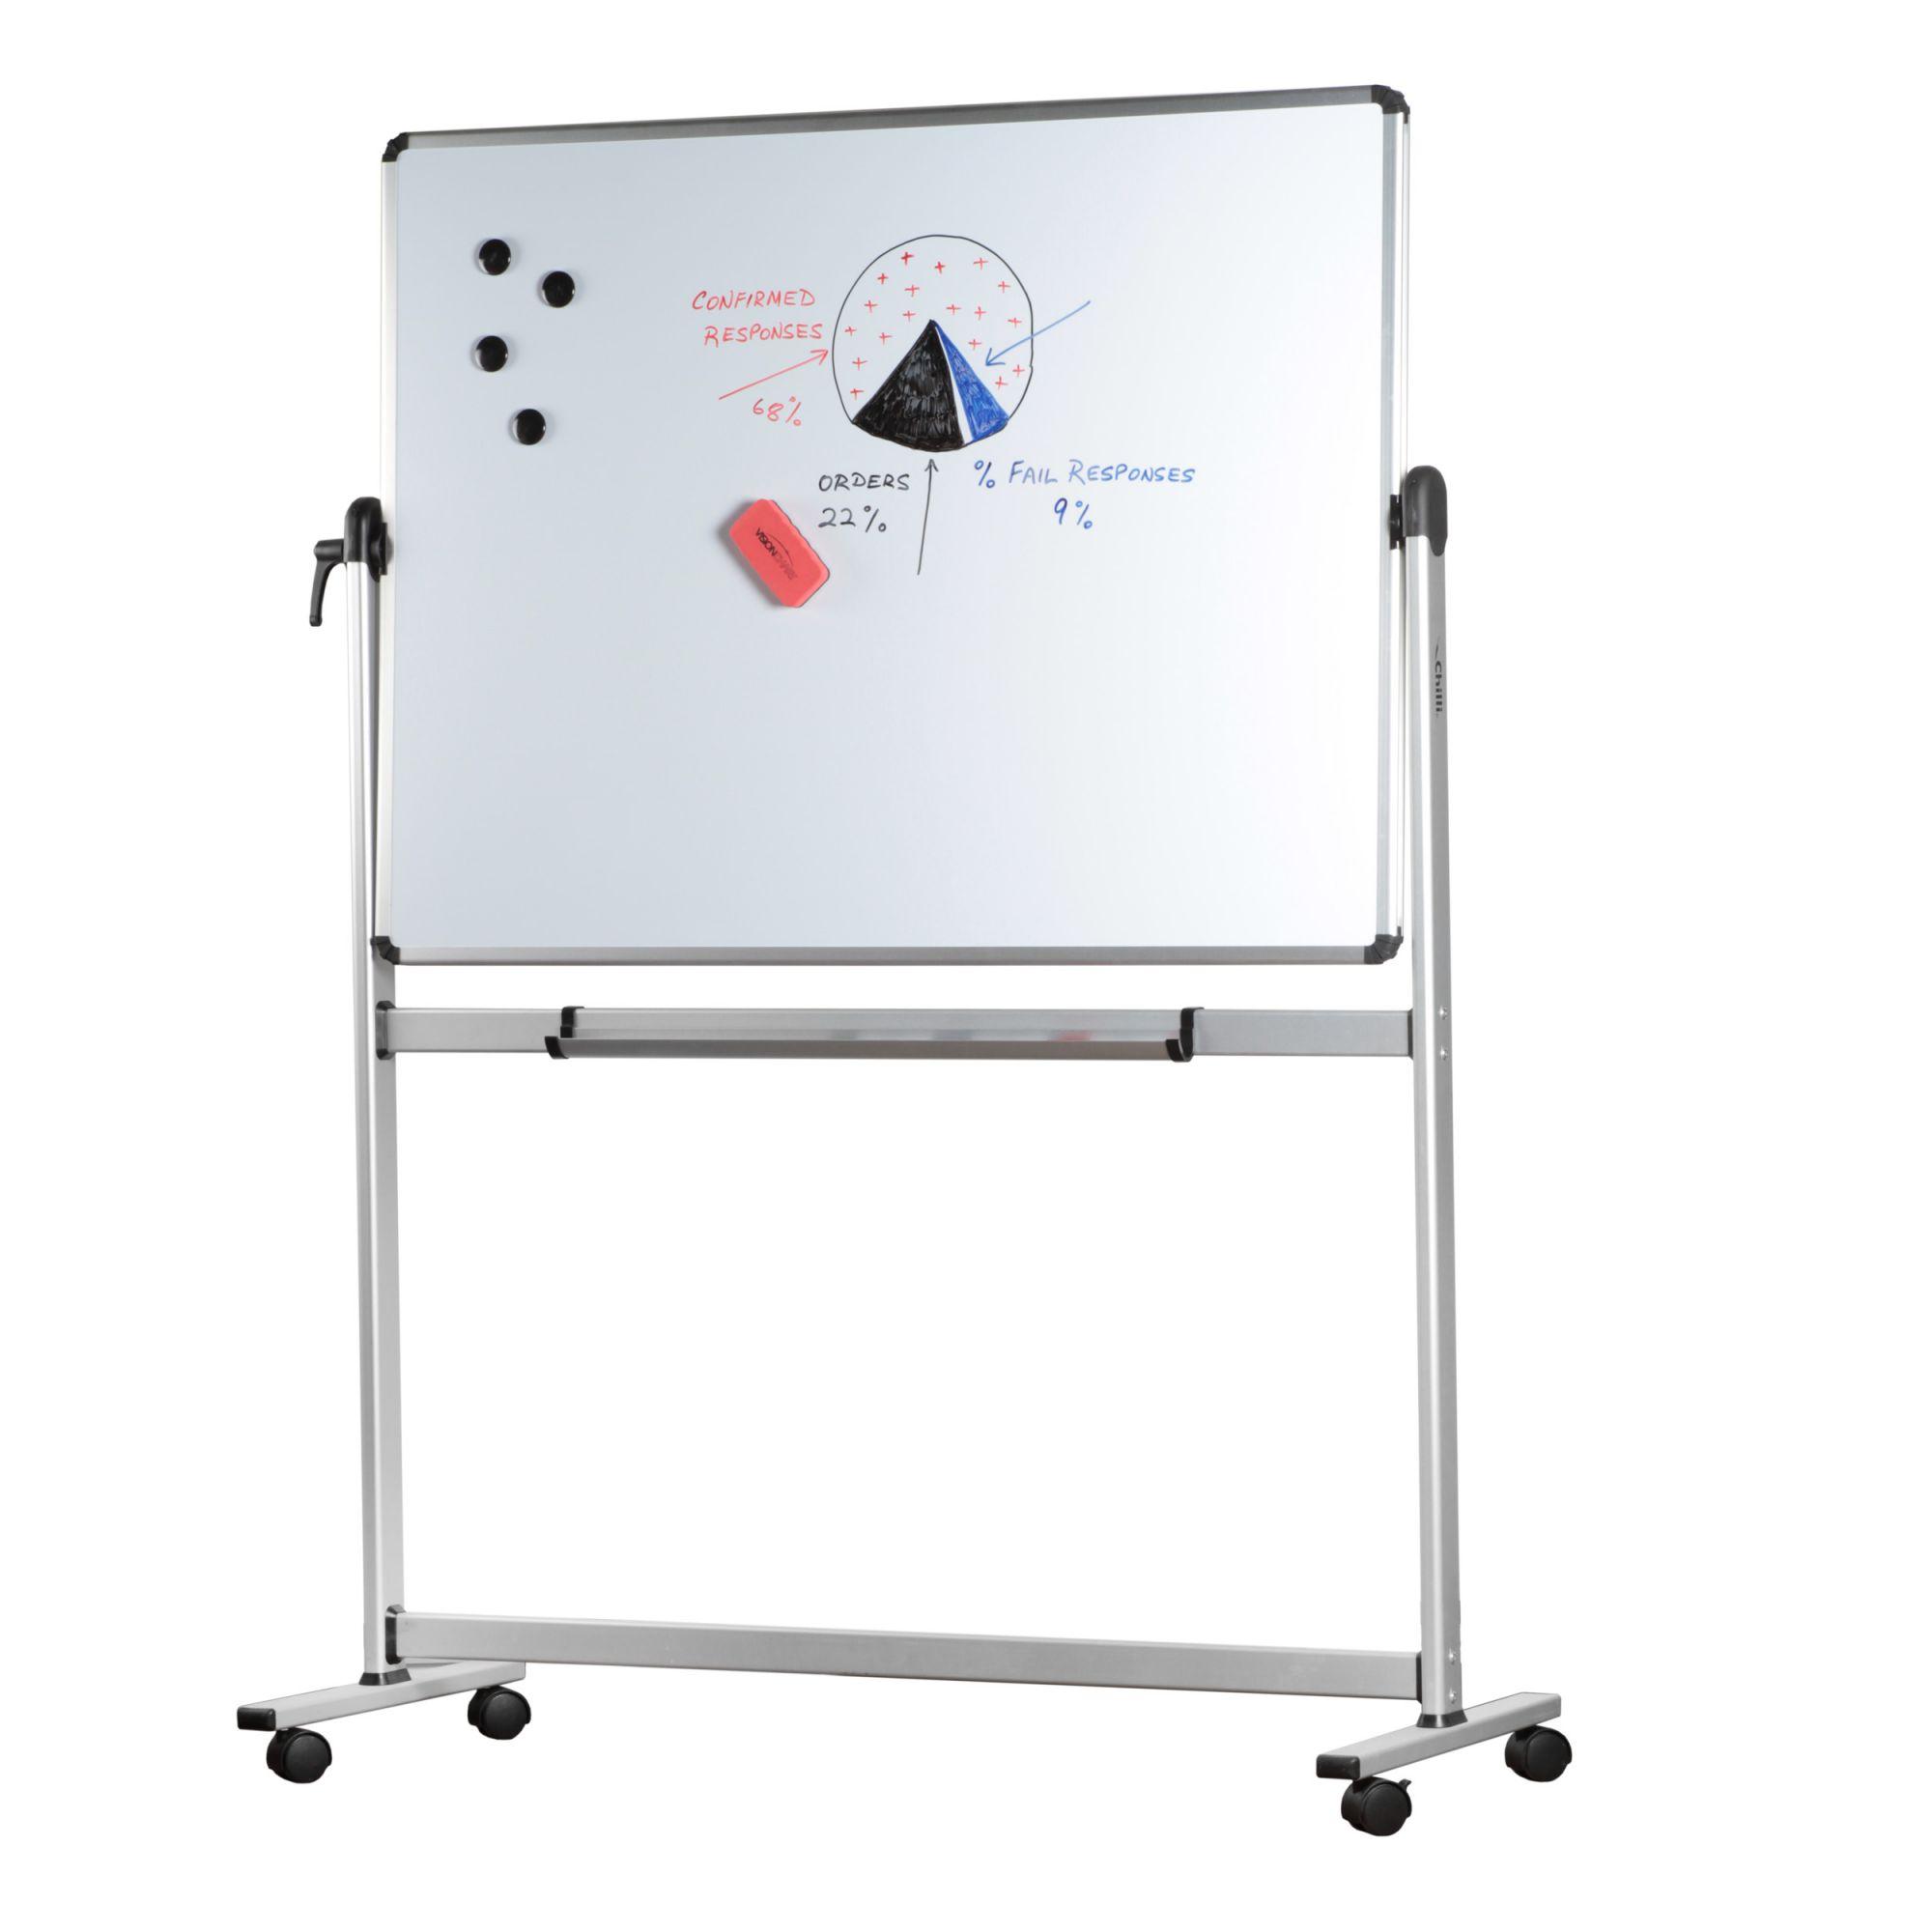 Mobile Whiteboards Specfurn Commercial Office Furniture